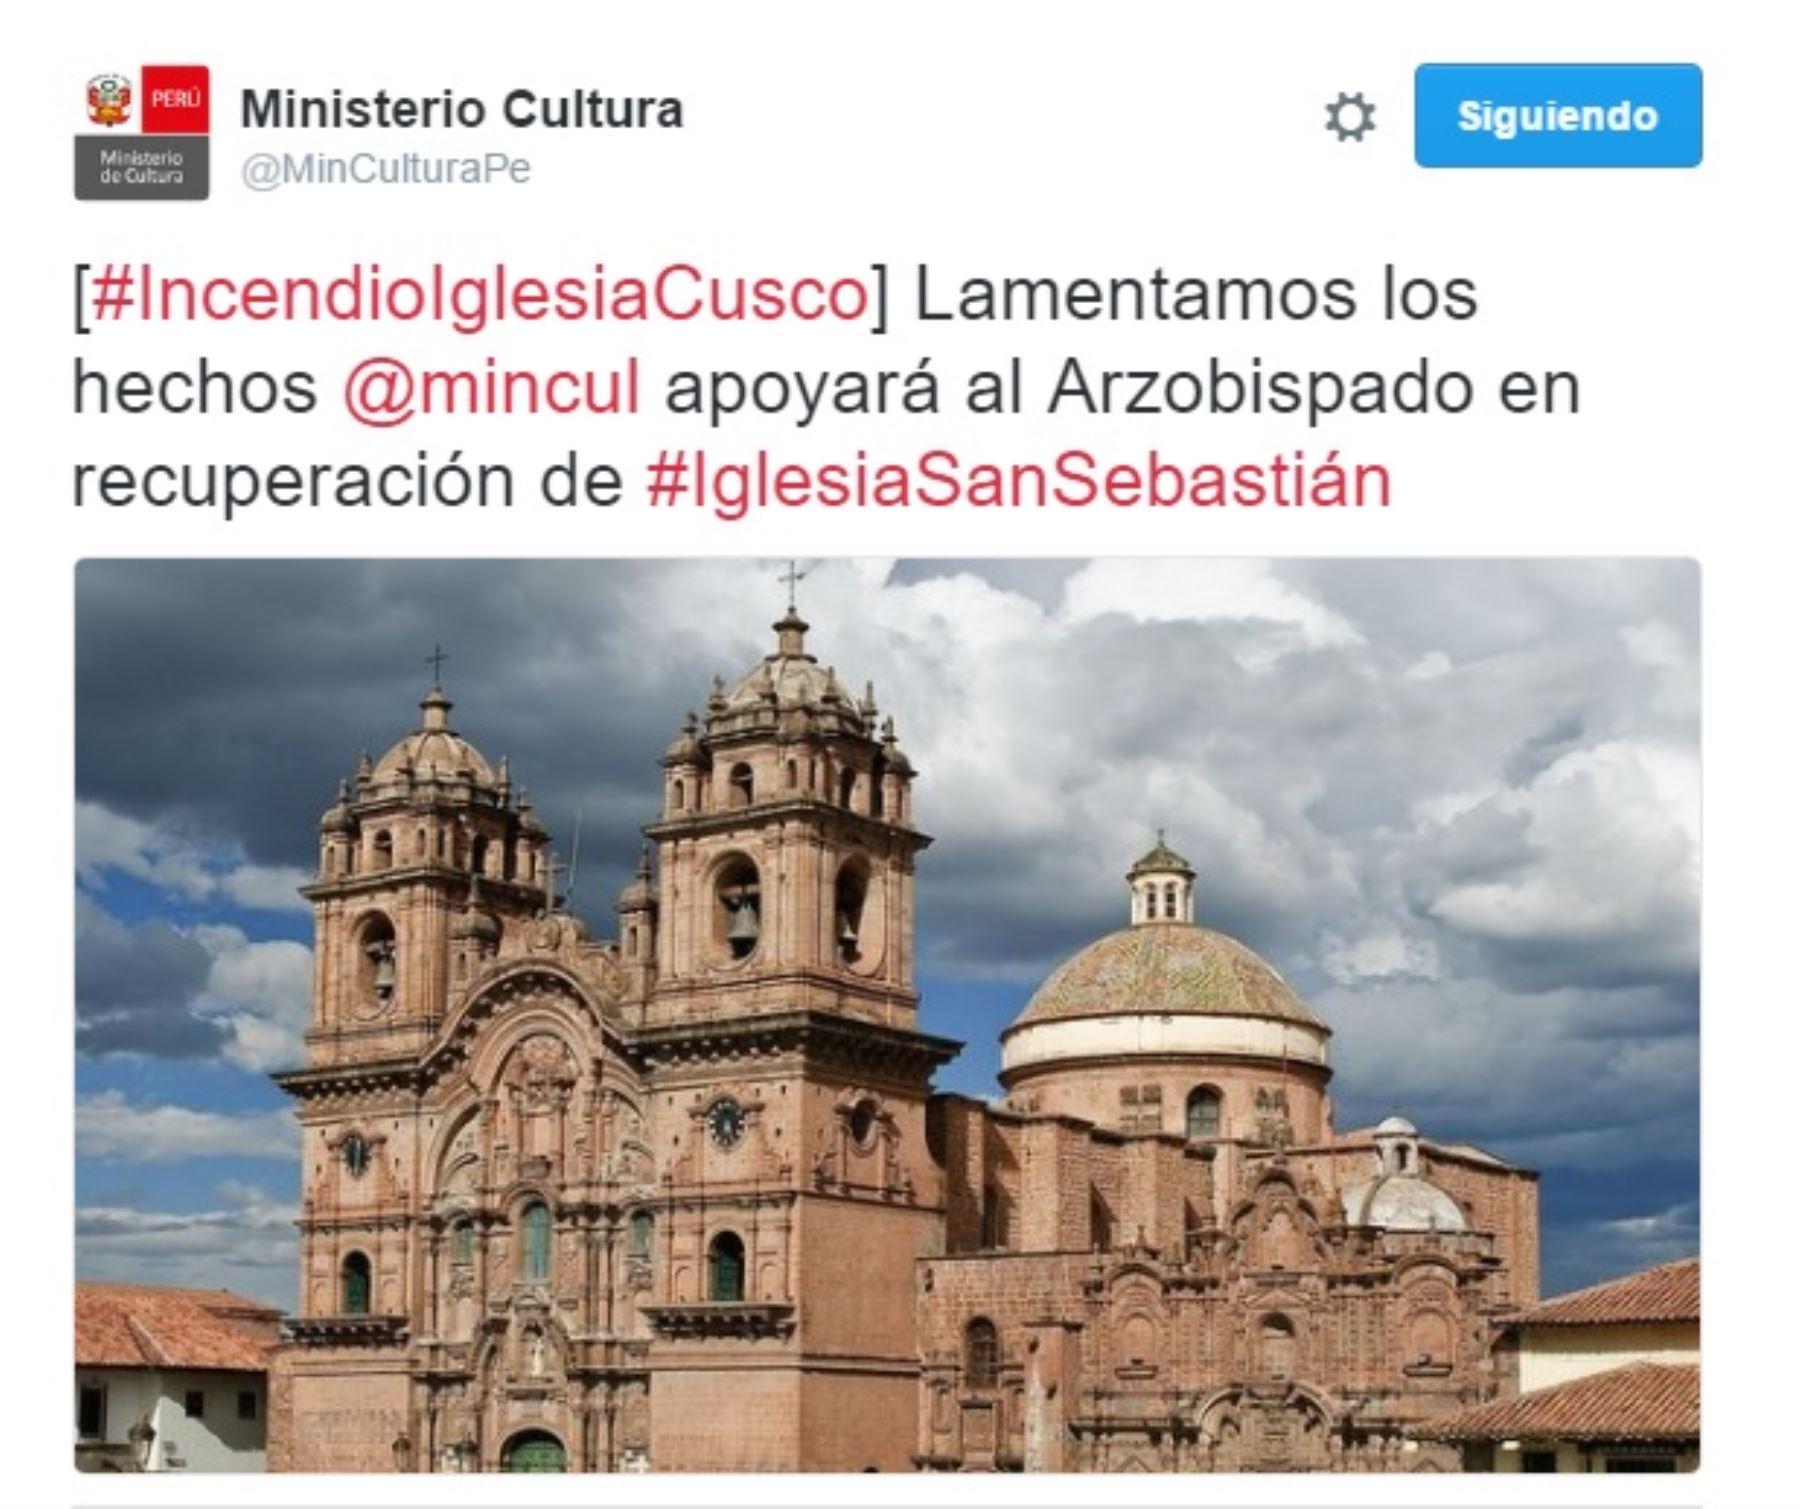 Twitter del Ministerio de Cultura sobre incendio en iglesia cusqueña de San Sebastián